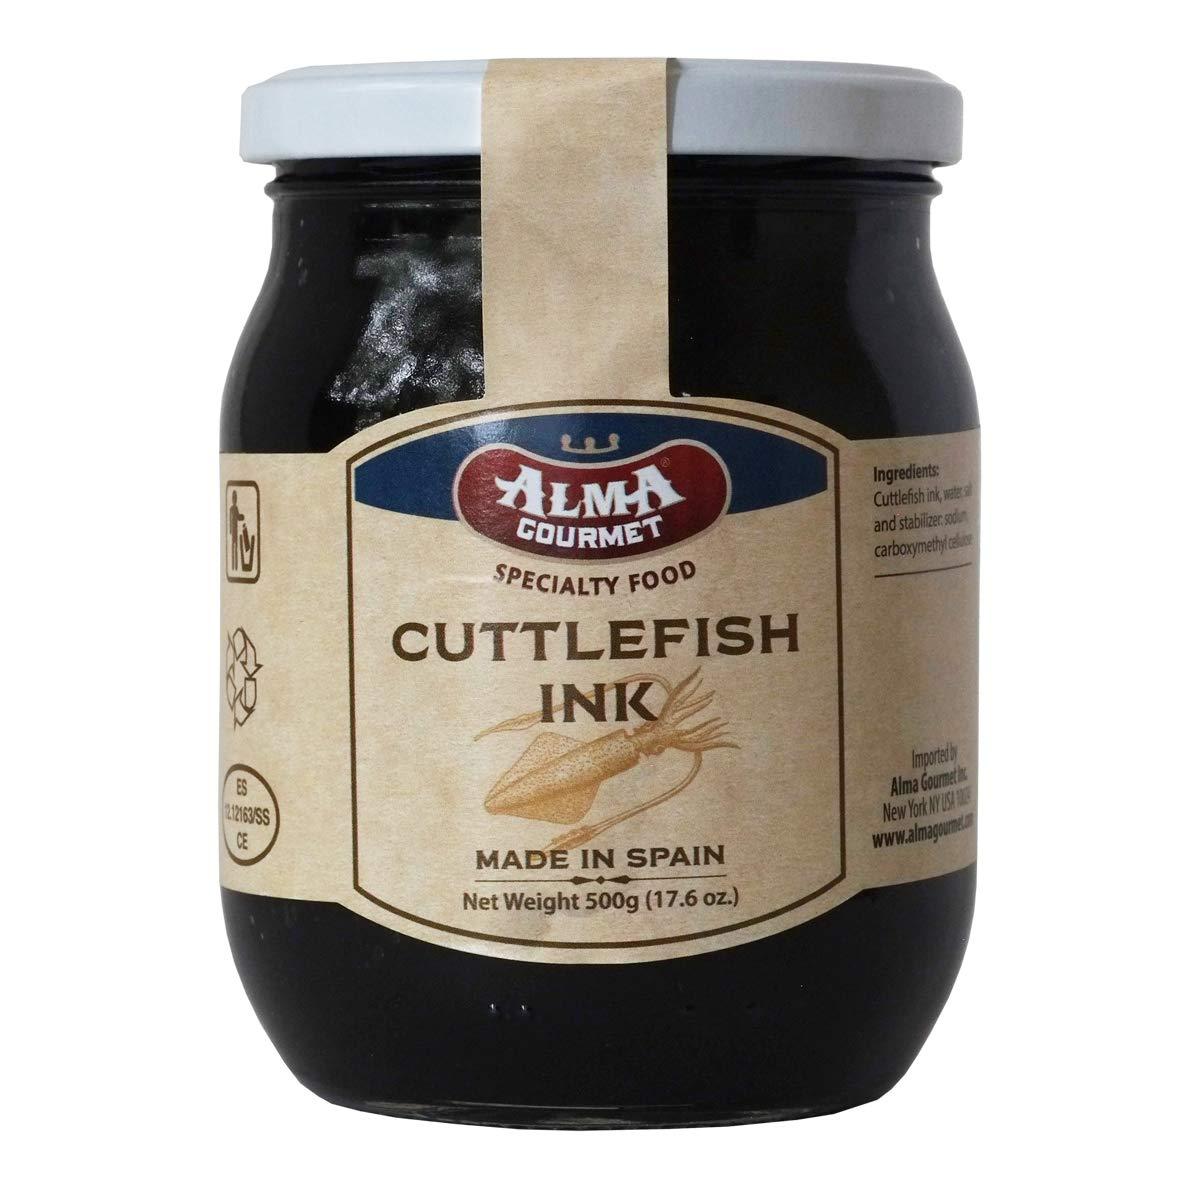 Alma Gourmet Cuttlefish Ink Jar (17.6 Ounce) 500 Gram